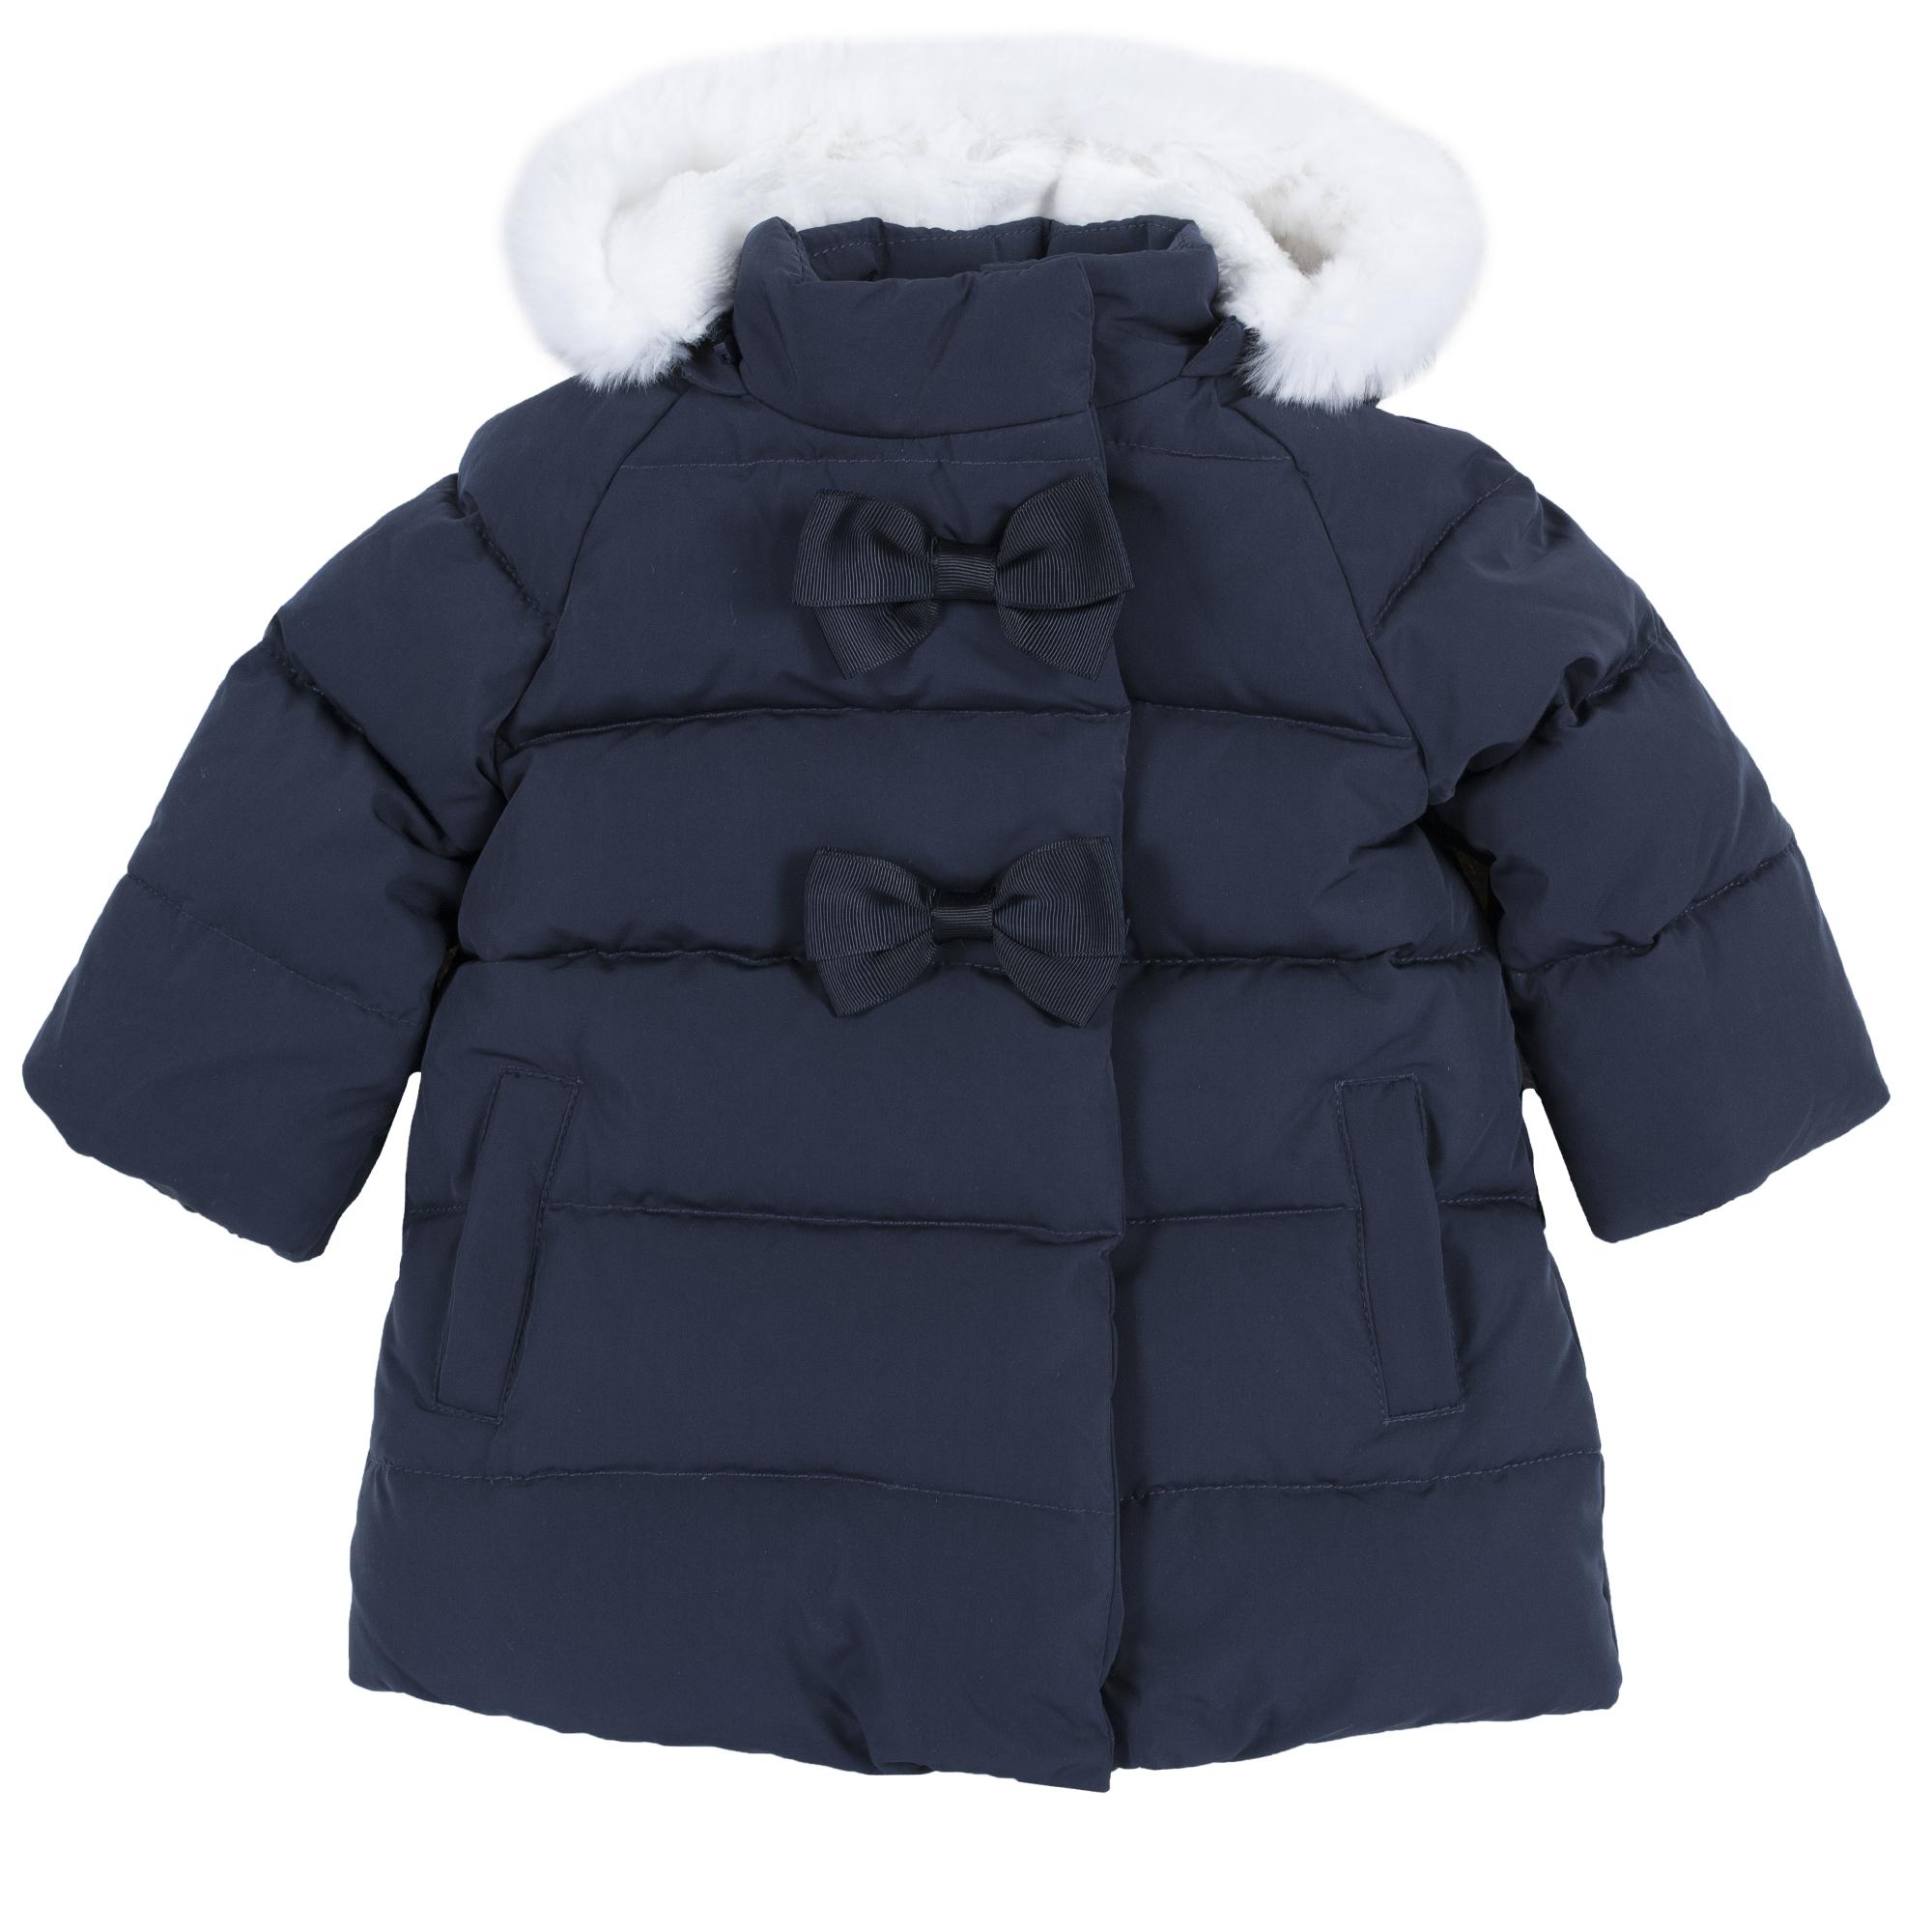 Jacheta copii Chicco, cu puf si pene de rata, bleumarin, 87428 din categoria Jachete copii